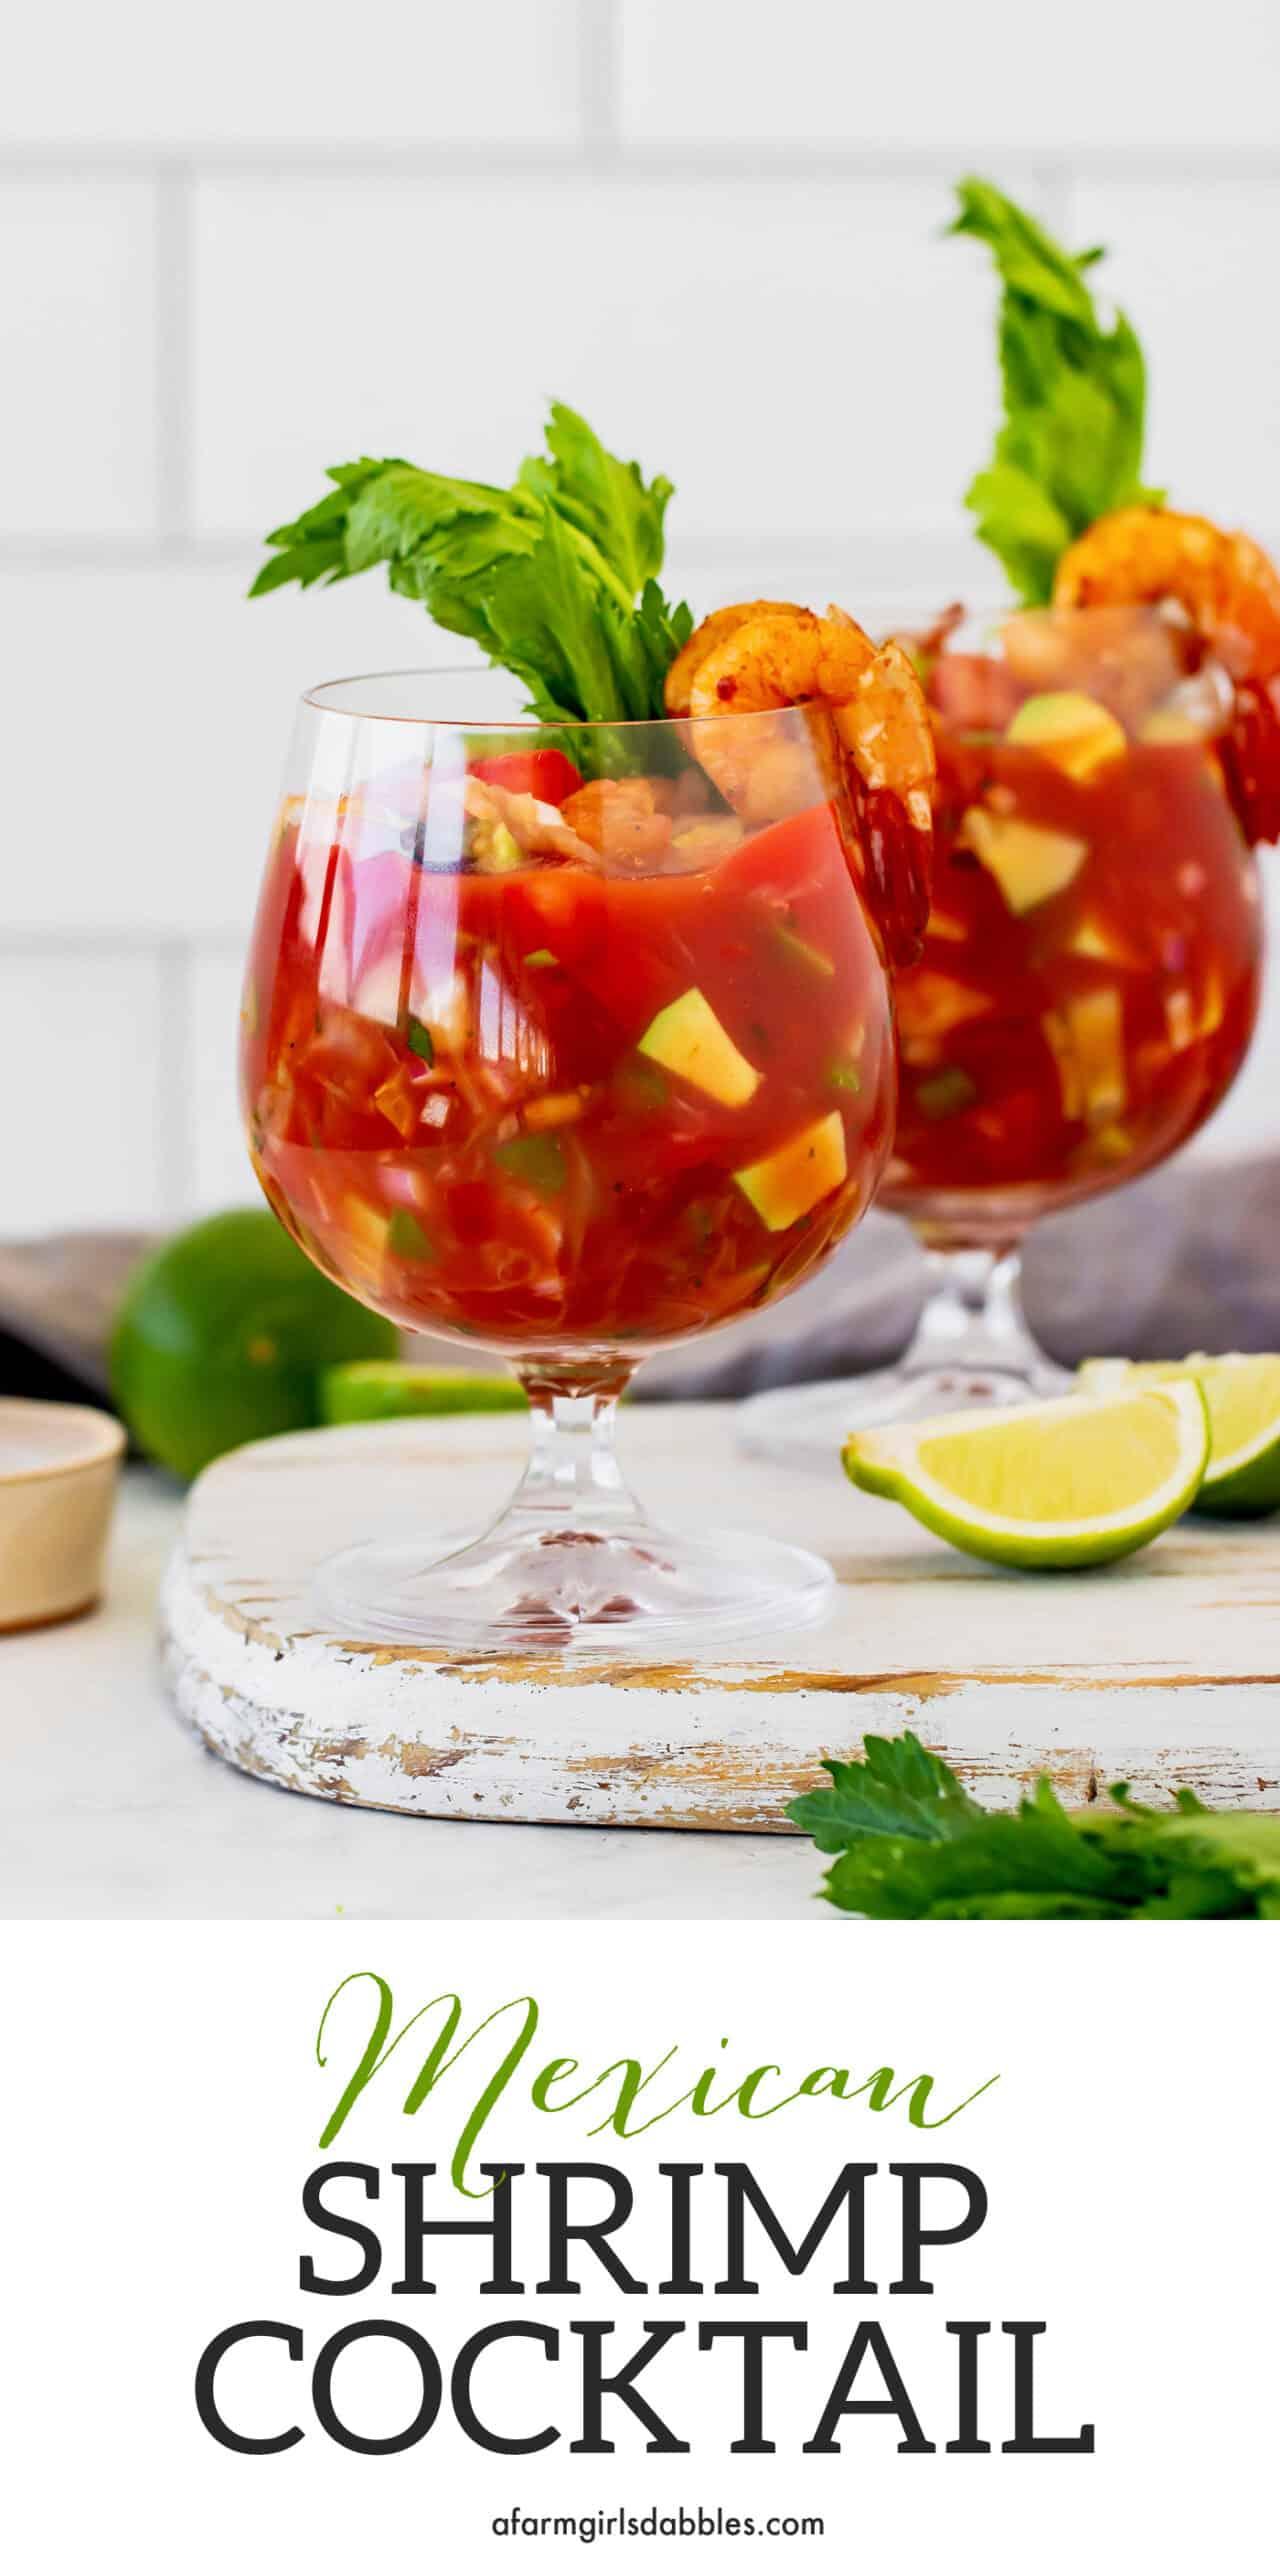 Pinterest image for Mexican shrimp cocktail